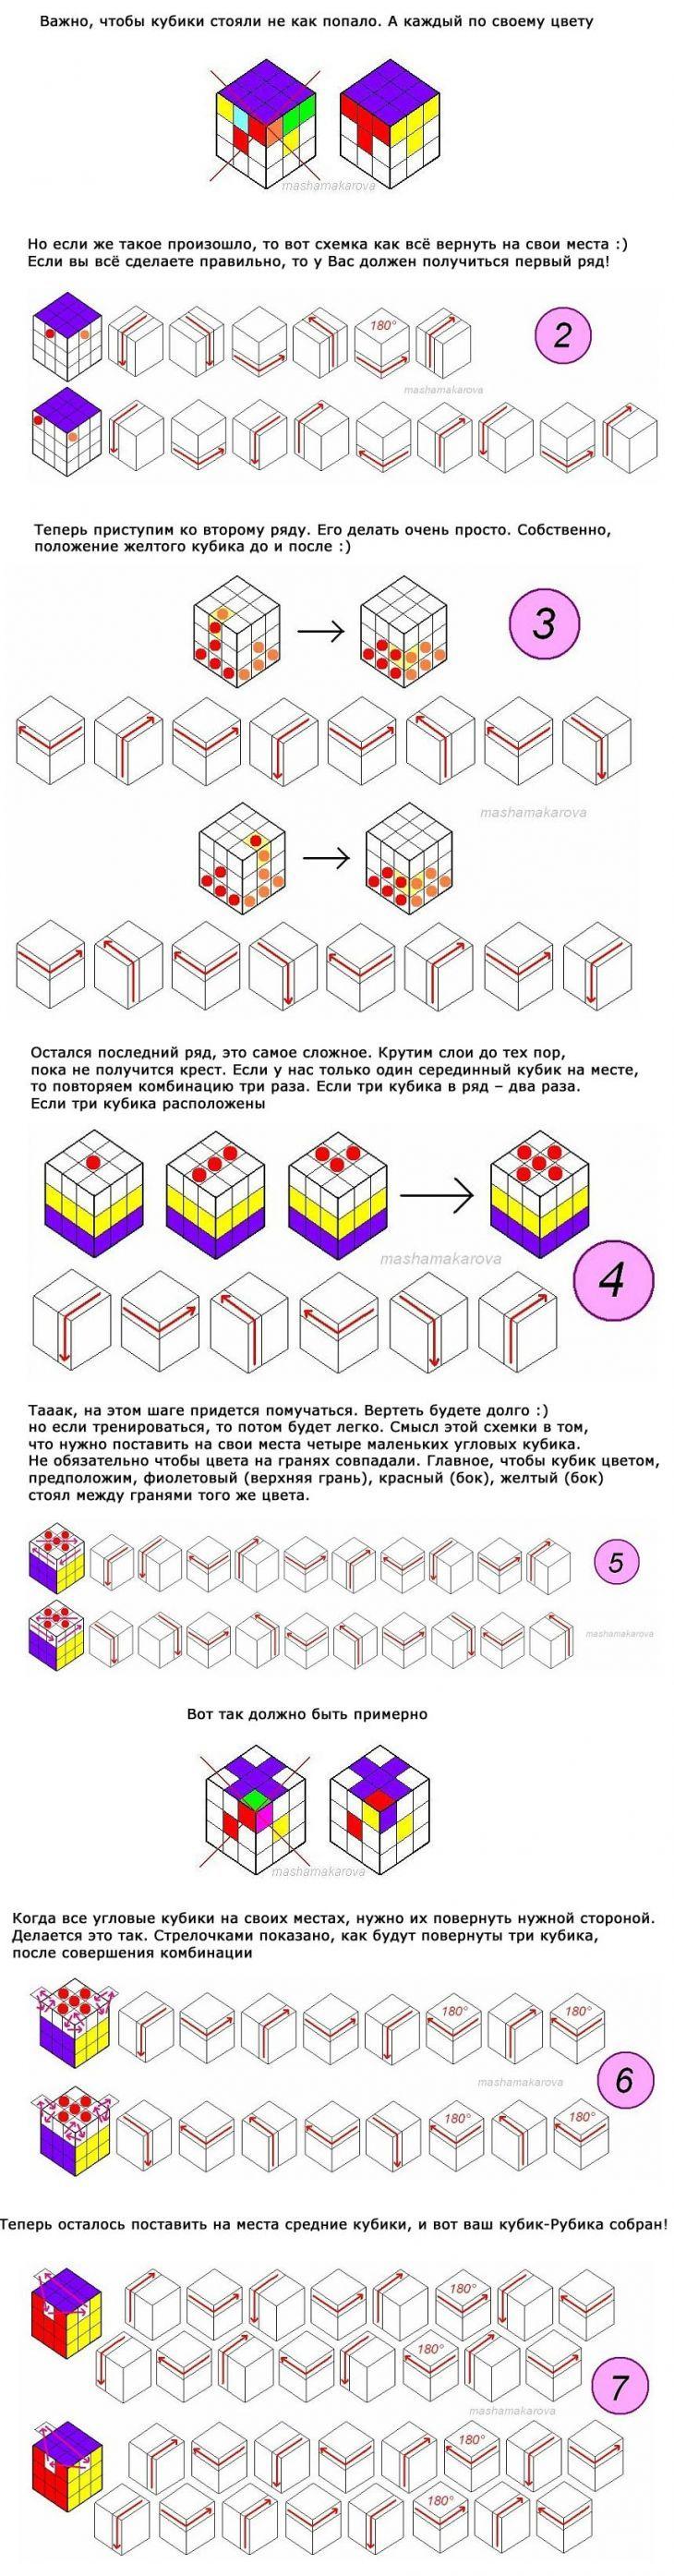 Собираем кубик рубика схема сборки